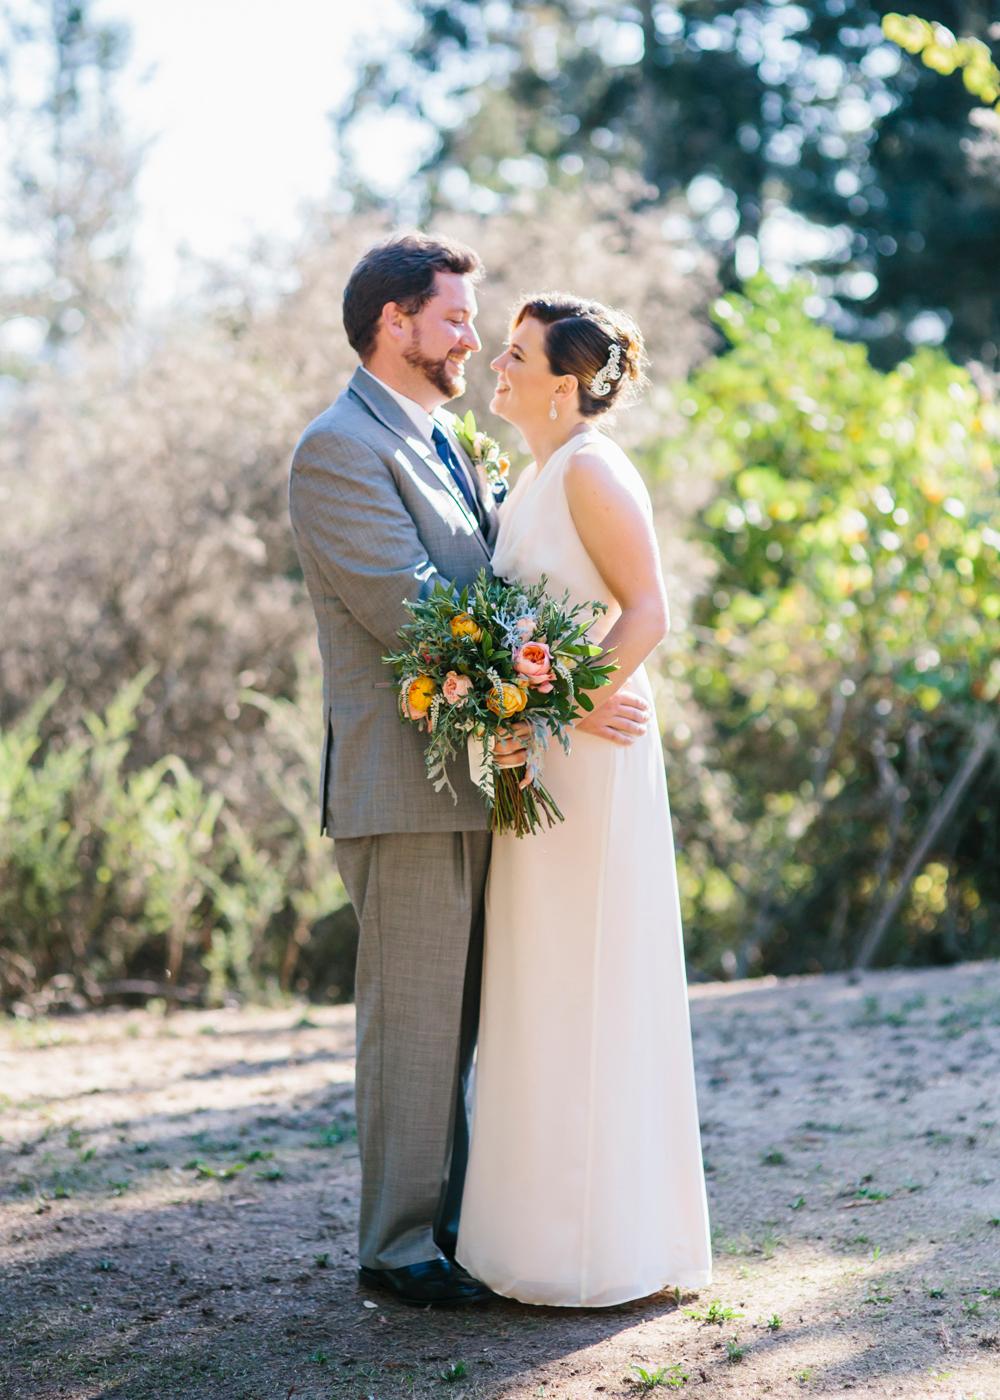 pema-osel-ling-santa-cruz-wedding-photography-lilouette-60.jpg